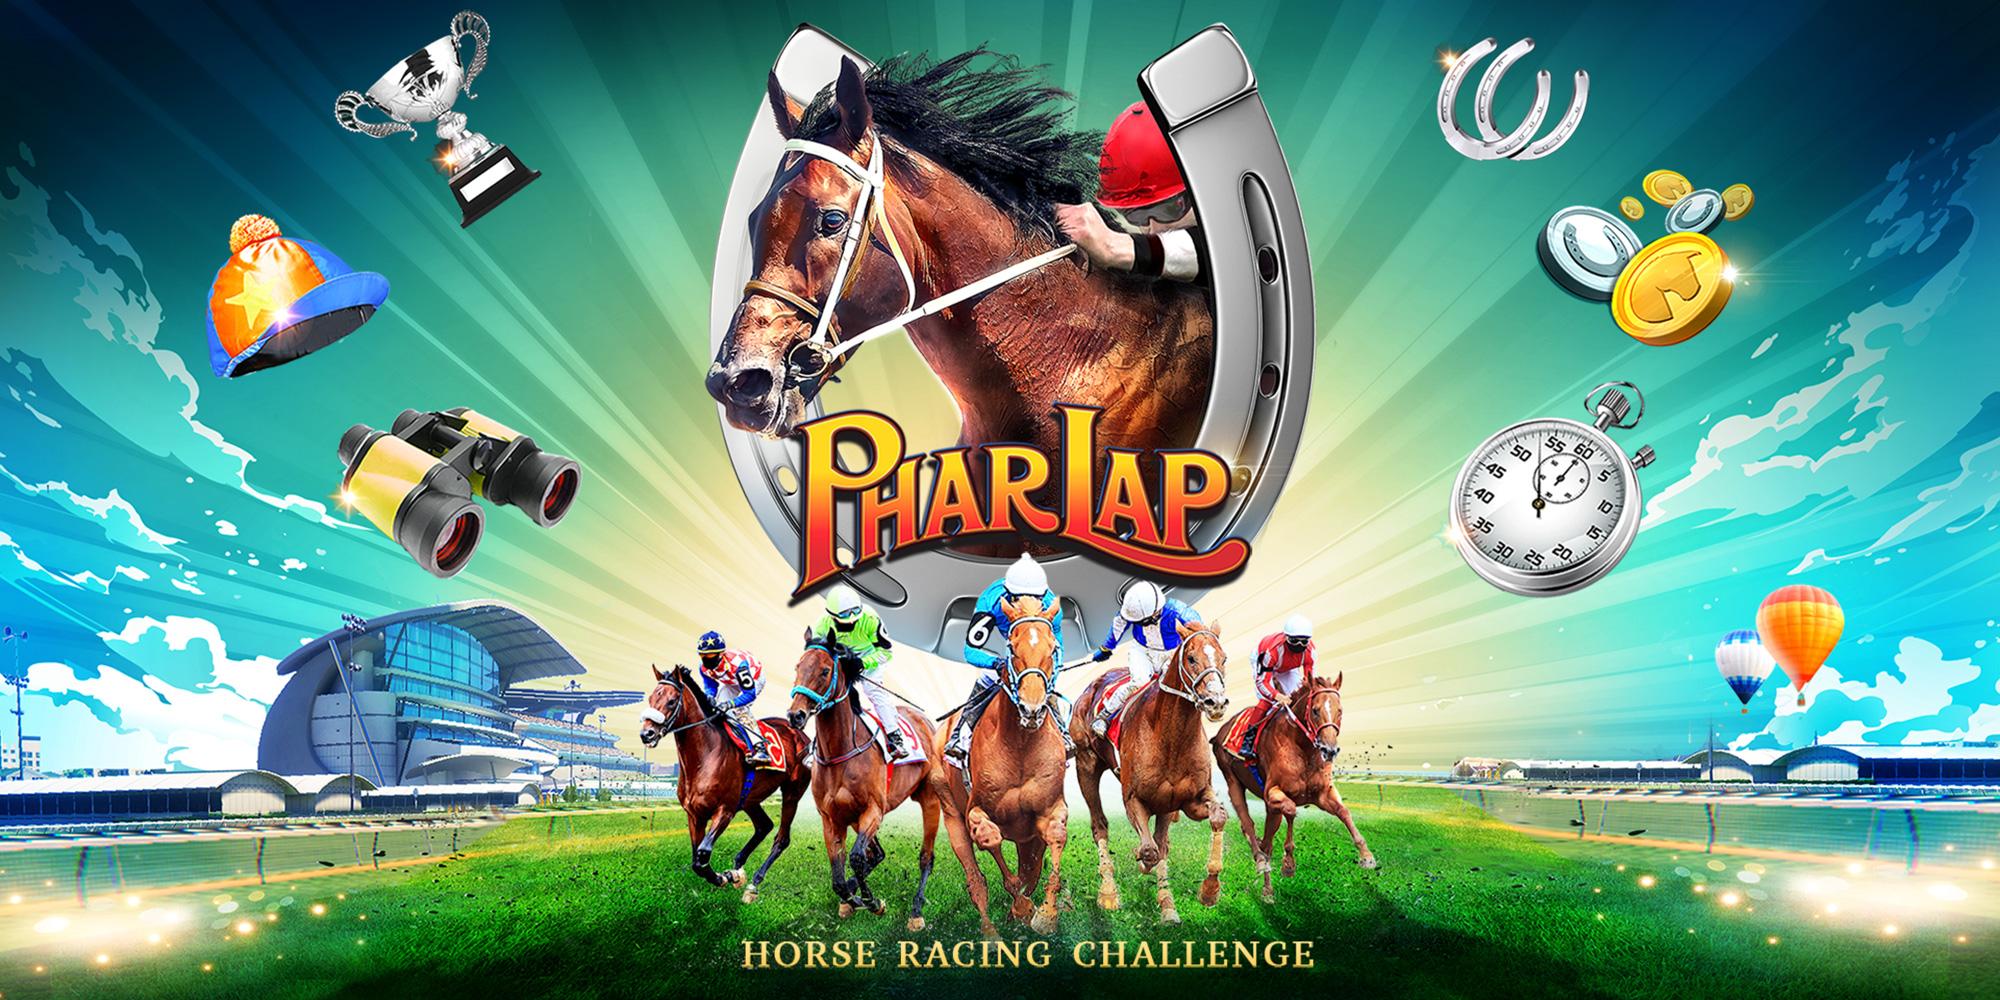 Phar Lap Horse Racing Challenge Nintendo Switch Games Nintendo